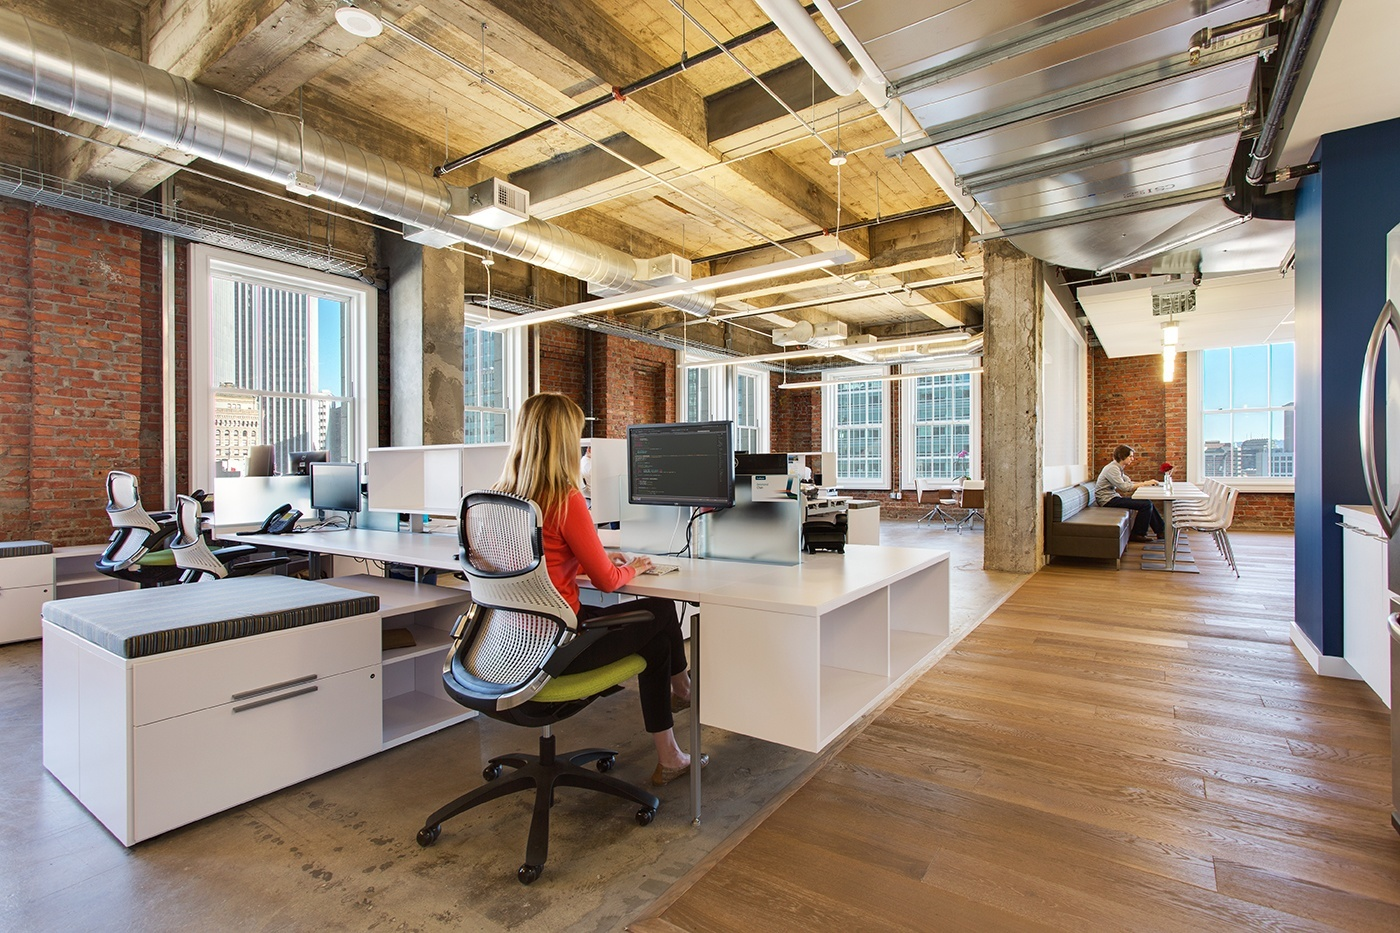 office design software. Workspace\u2026 Office Design Software E